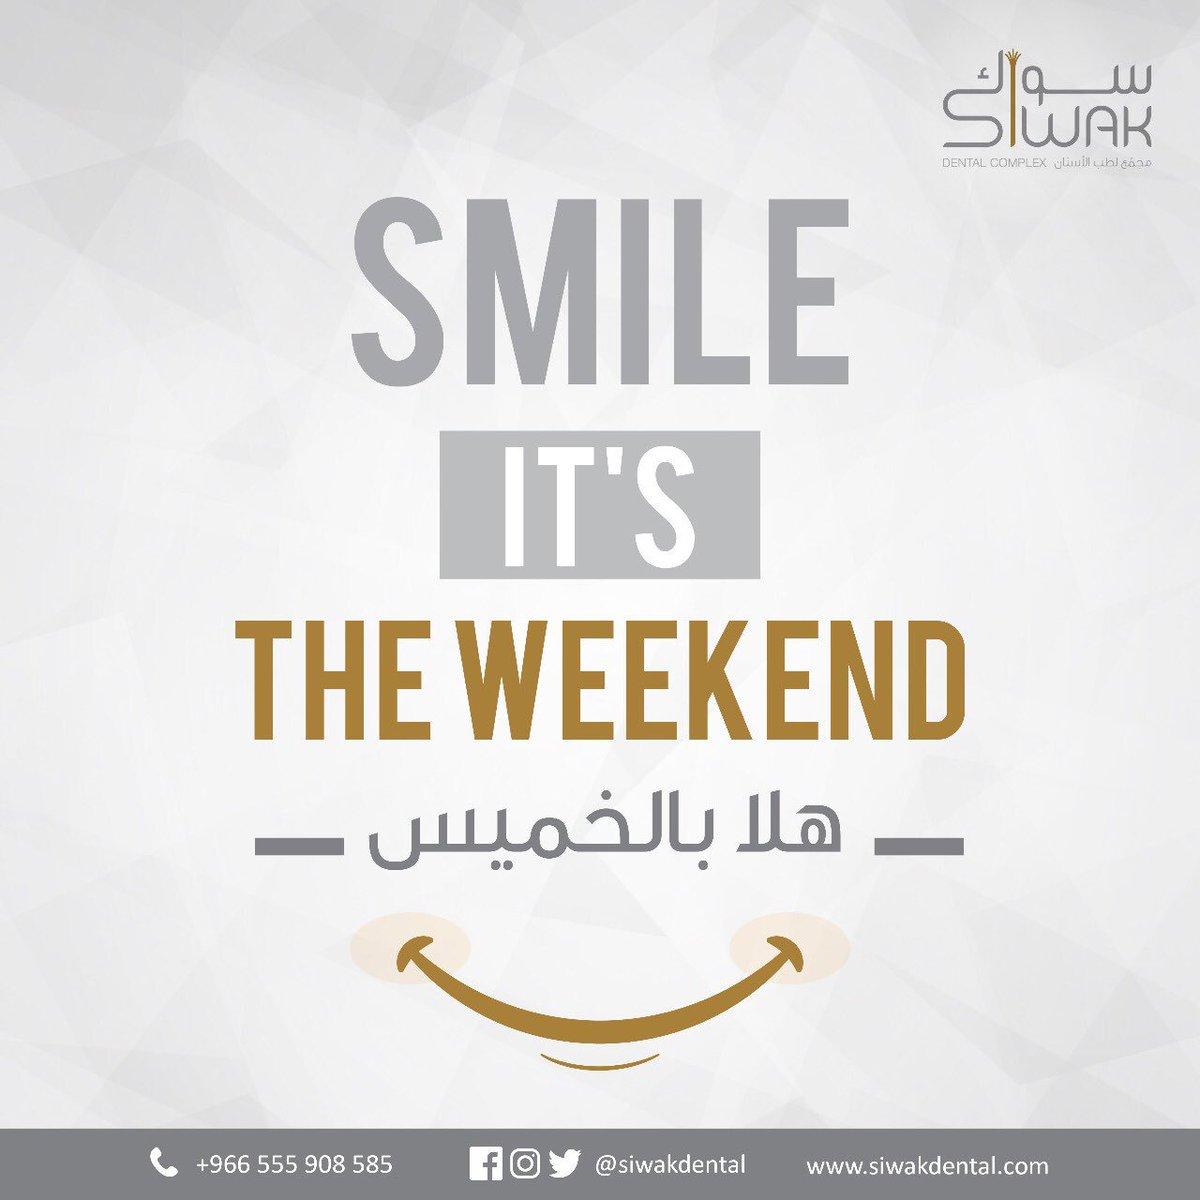 Siwak Dental On Twitter Have A Nice Weekend يوم الخميس ويكند ويكند ياعيال